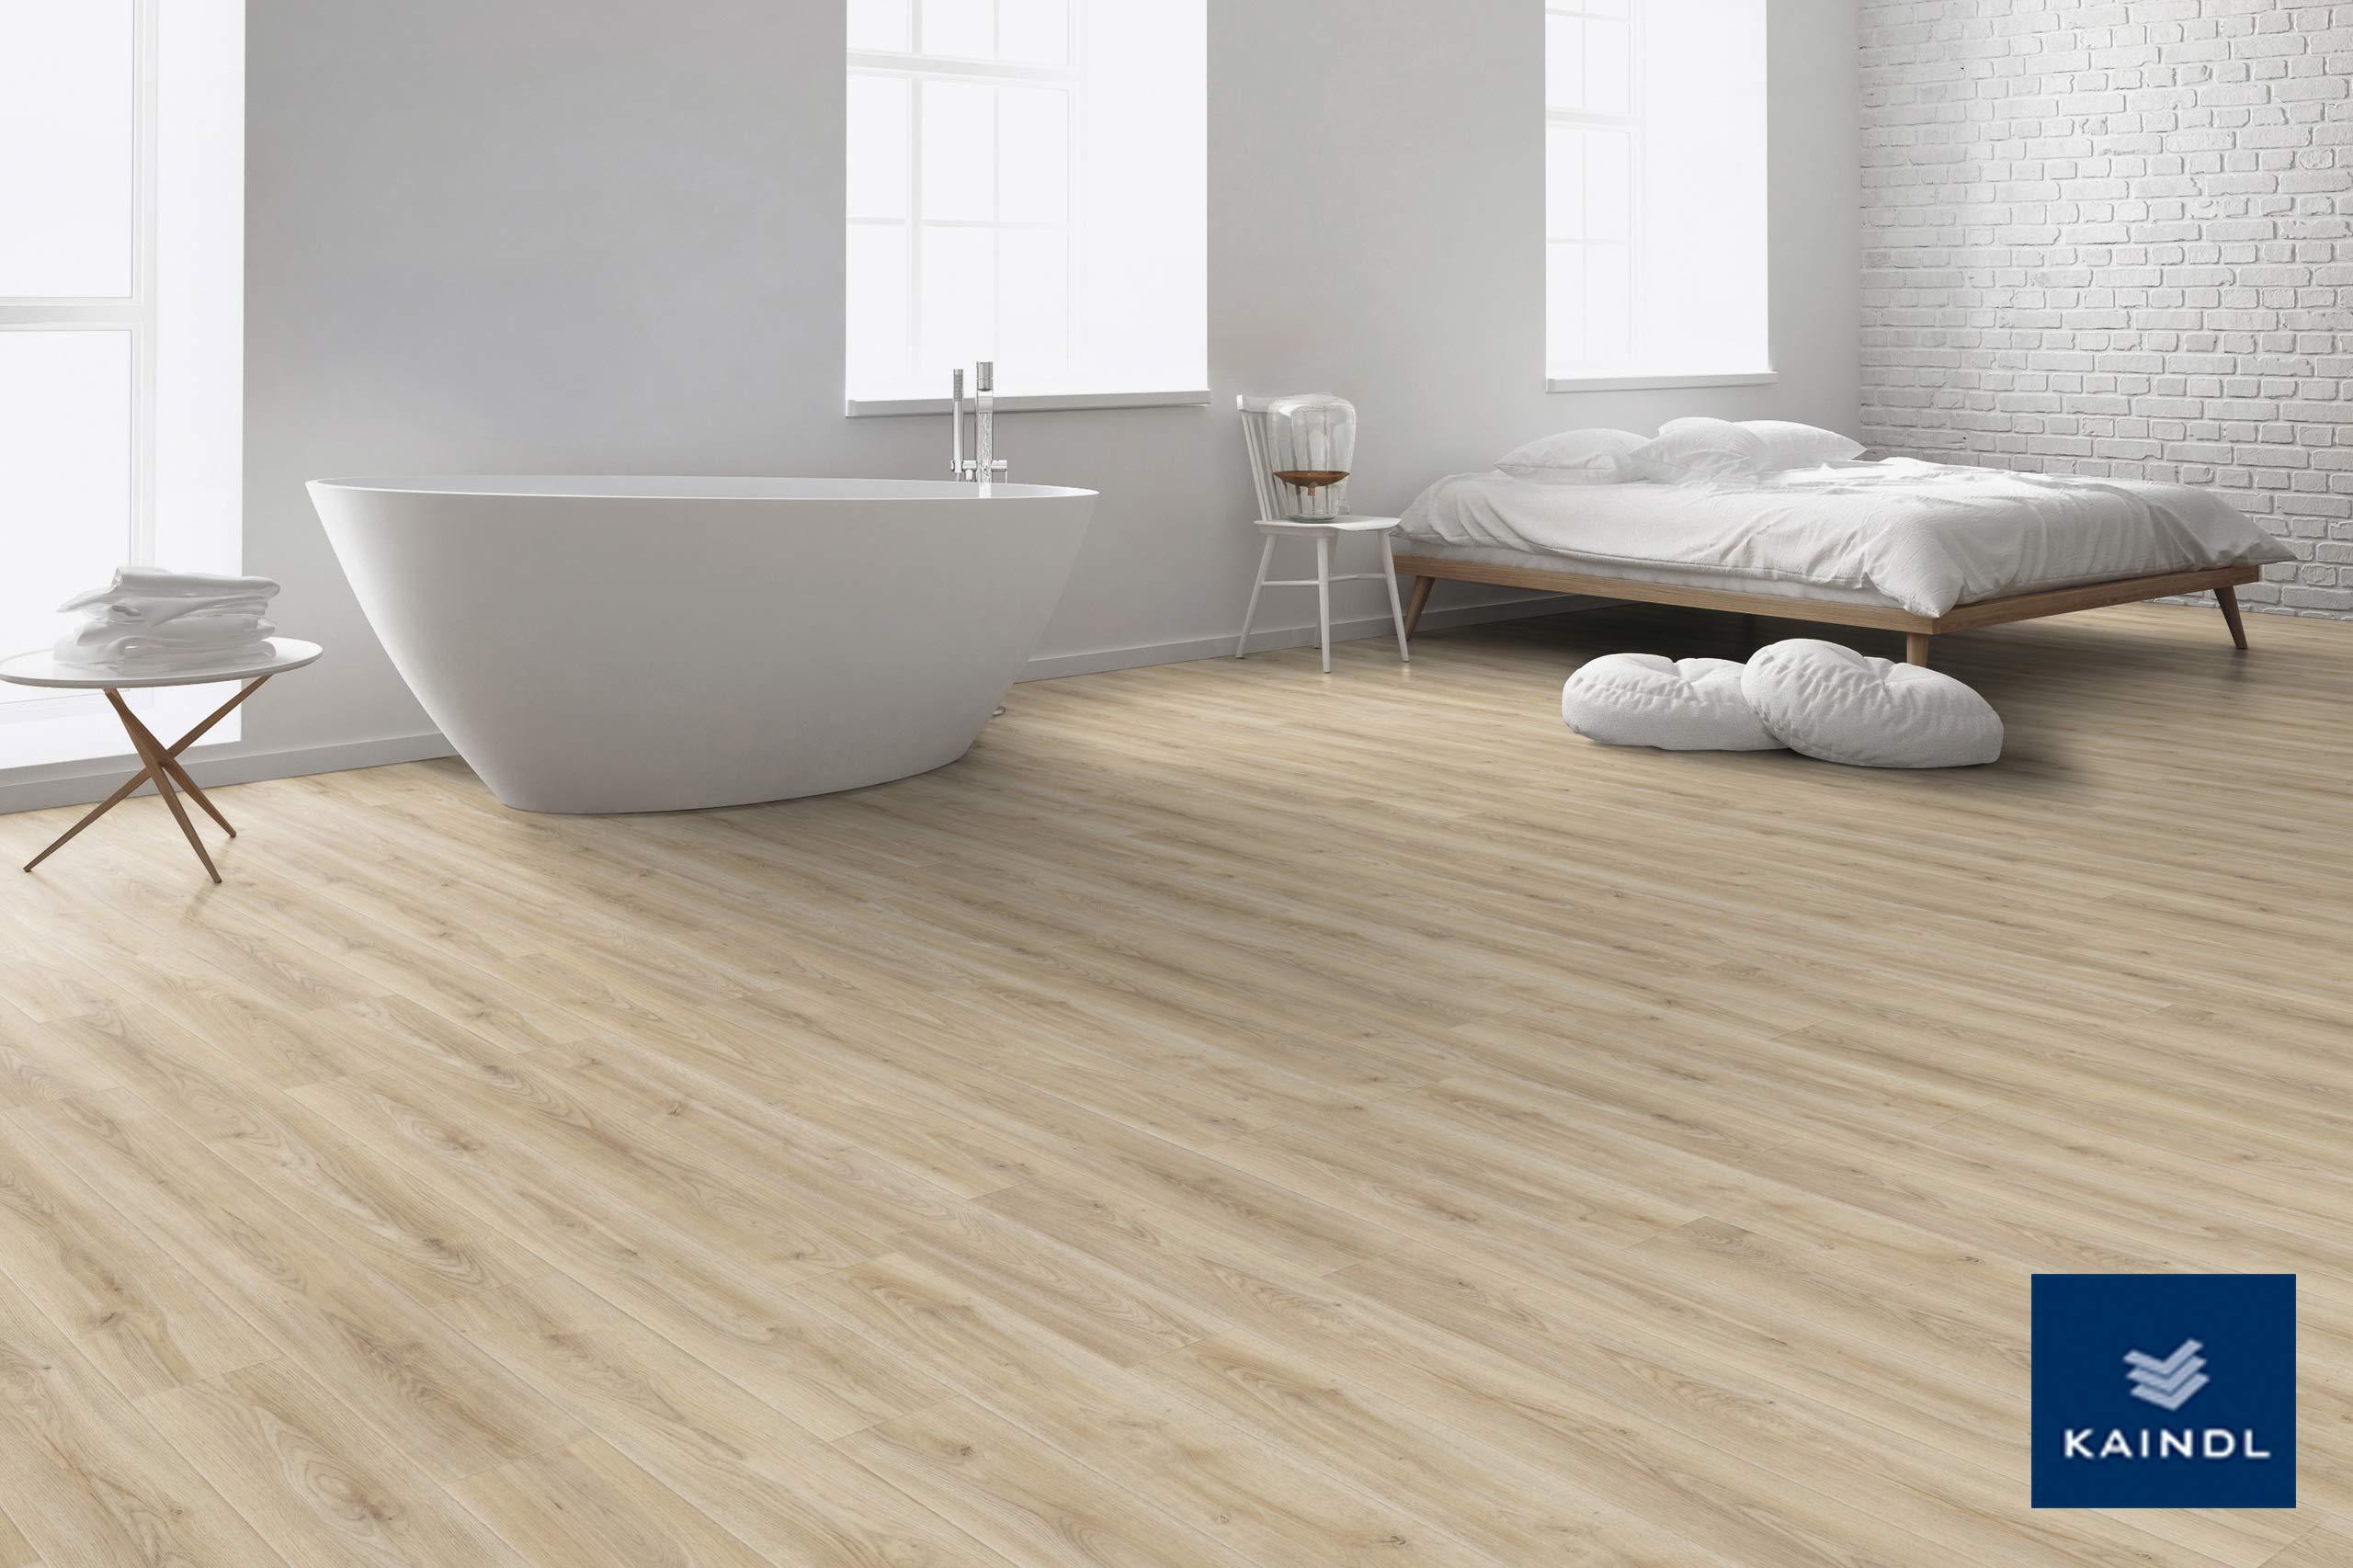 Sàn gỗ Kaindl Aqua Pro 12mm Kaindl-Aqua-Pro-12mm